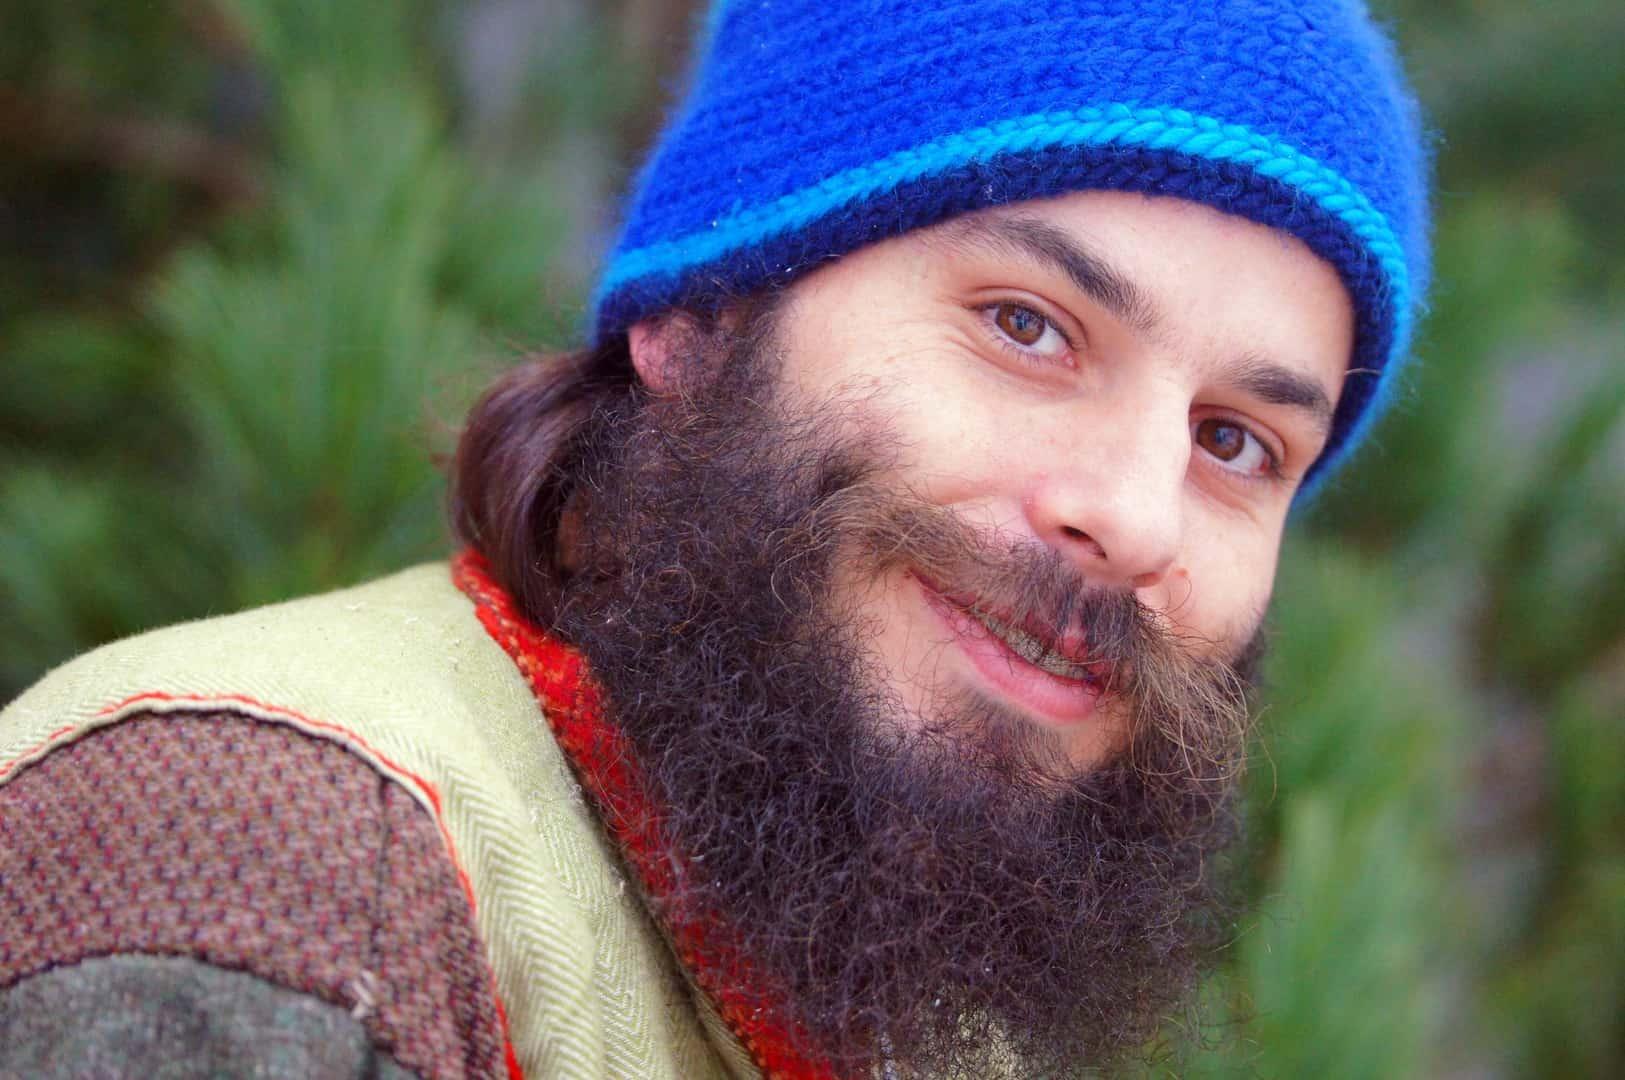 Man with curly beard